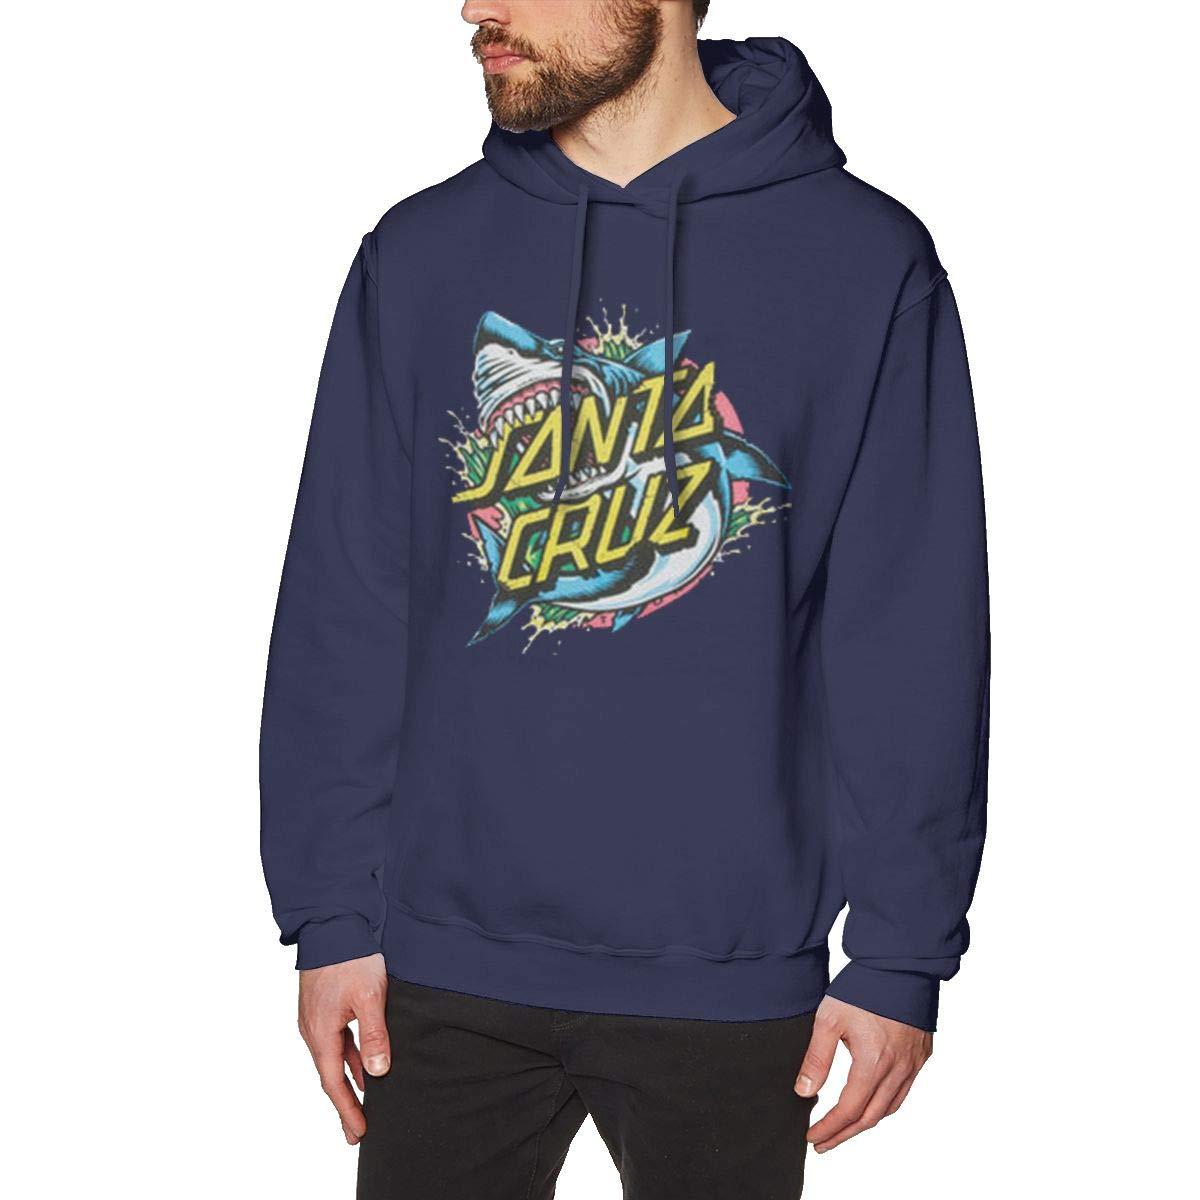 JiaoZhiduanxiu Mens Santa Cruz Classic Navy Hoodie Sweatshirt Jacket Pullover Tops